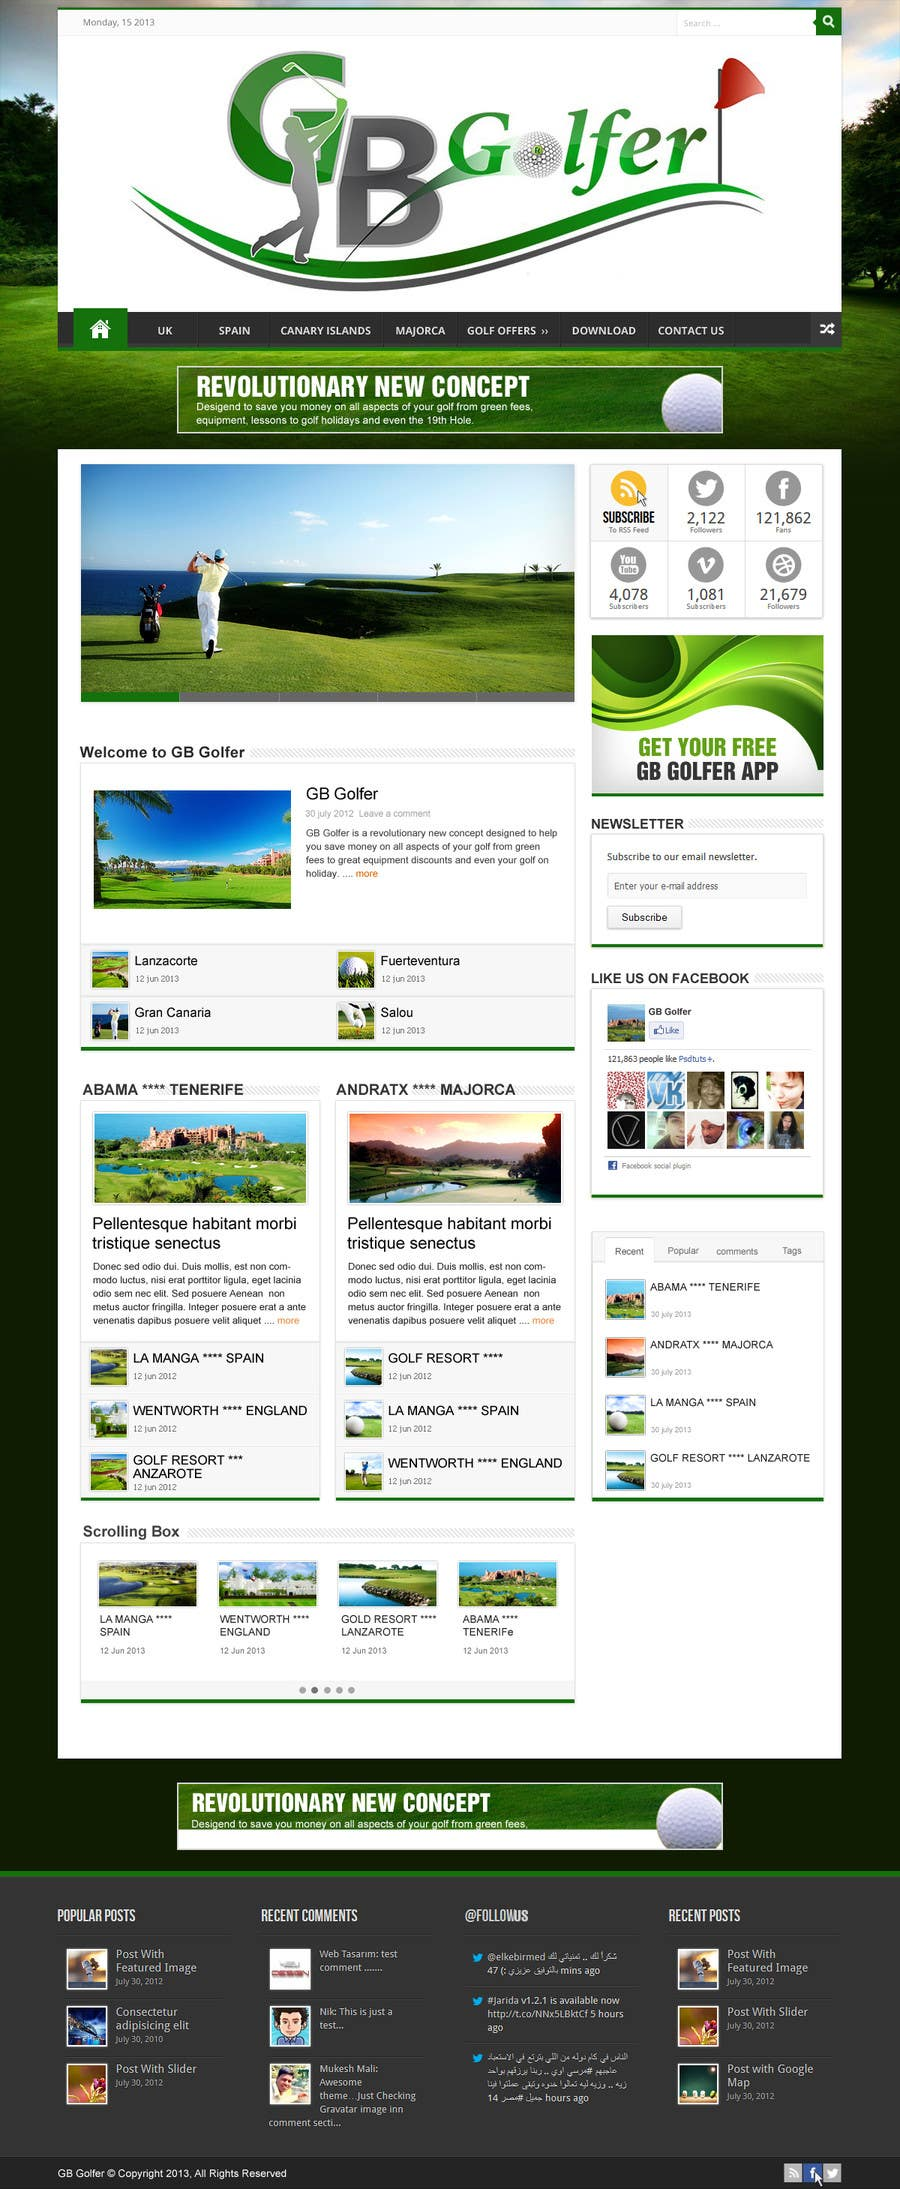 Konkurrenceindlæg #                                        7                                      for                                         Wordpress Theme Design for GB Golfer